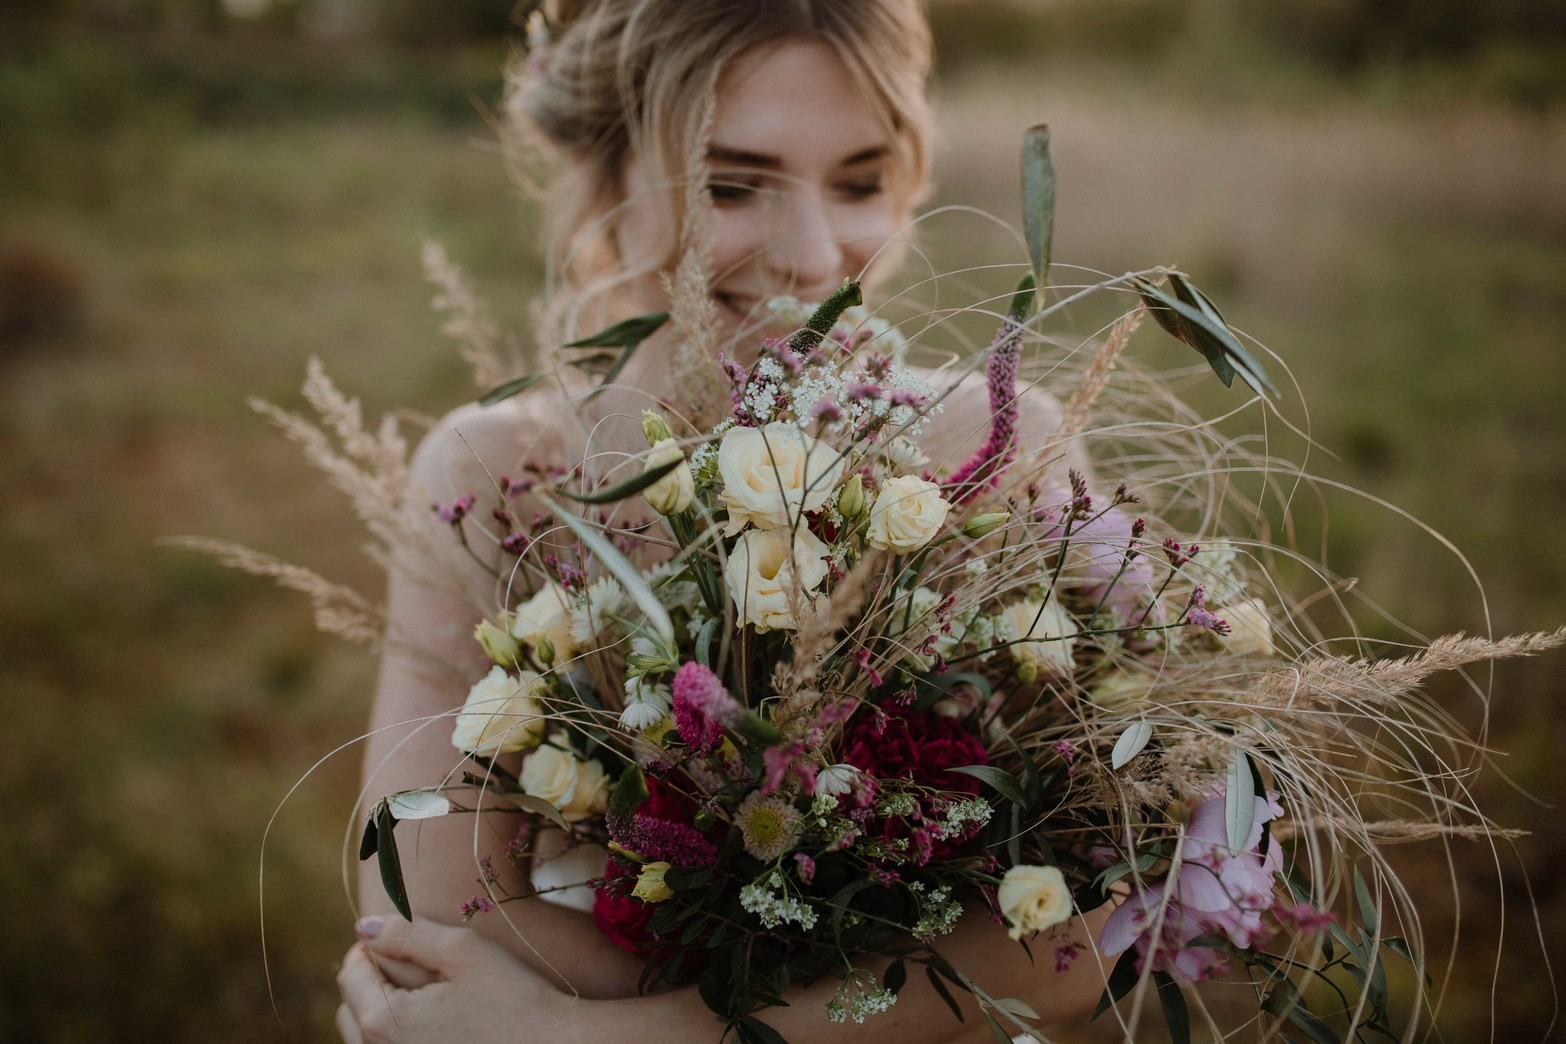 Wildflower_Julia_Pommerenke_Kiesgrube-13